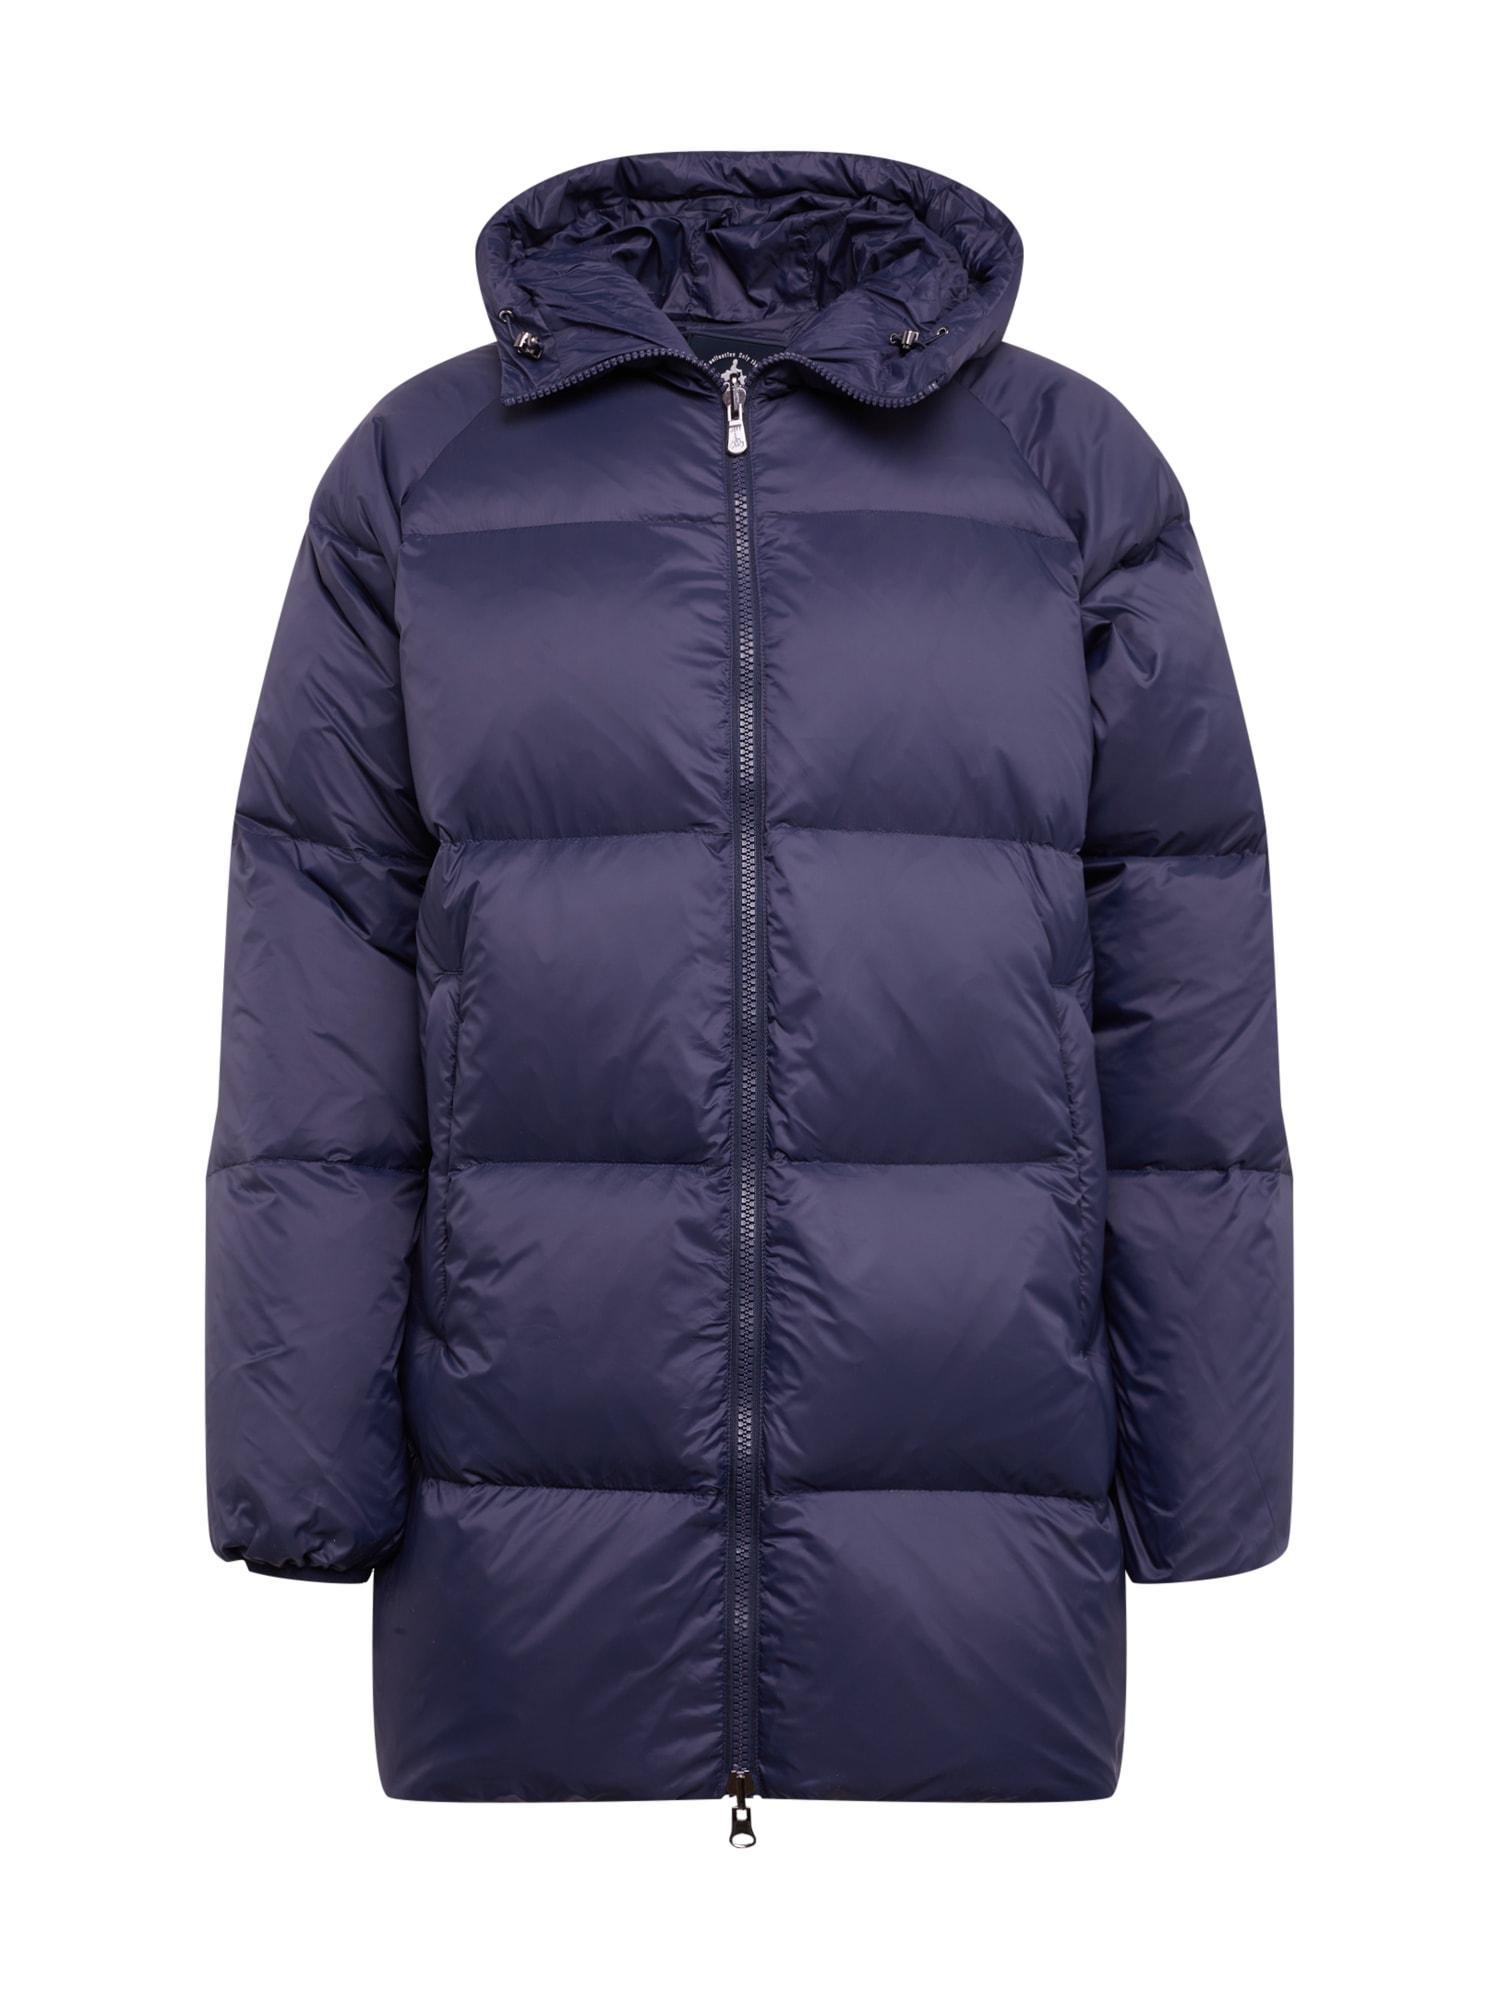 JOTT Žieminis paltas 'AVEYRON' mėlyna